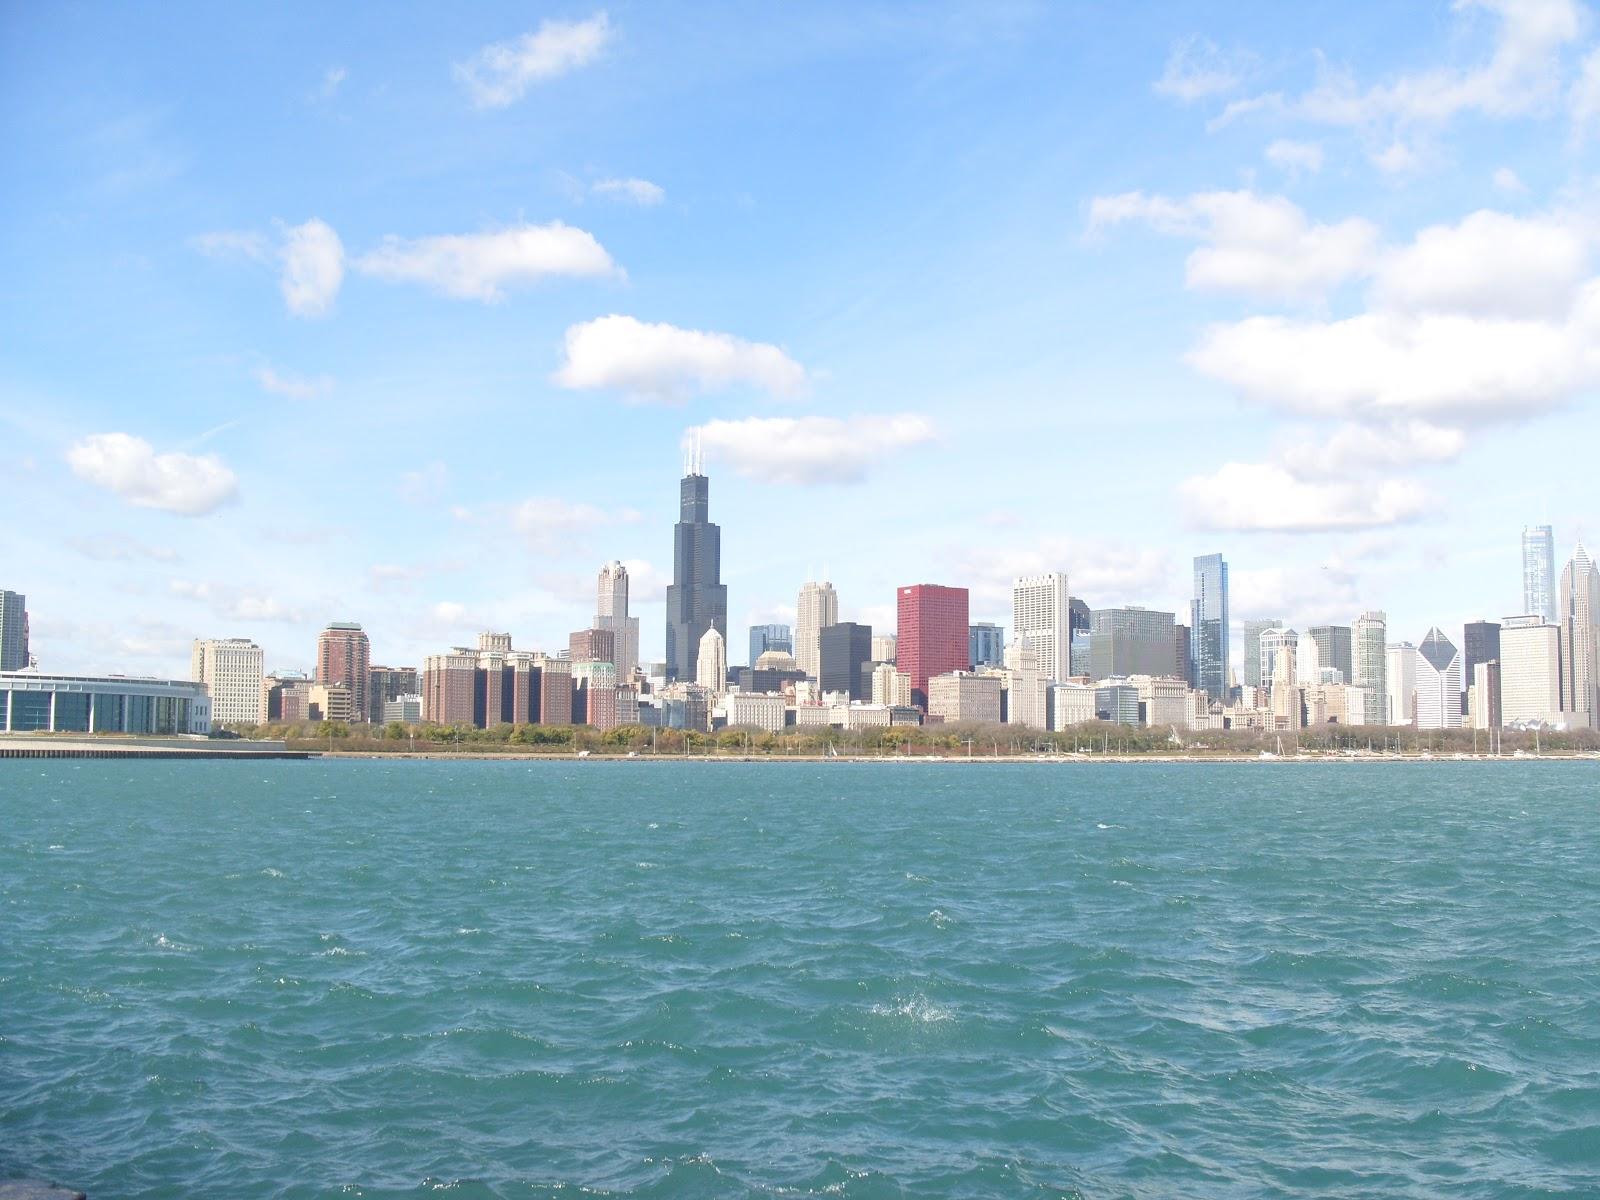 http://4.bp.blogspot.com/_1lDkgkbkQmA/TMIwk90hP9I/AAAAAAAAB3Q/IDGKpRaAJCU/s1600/Chicago+in+the+fall+2011+007.JPG